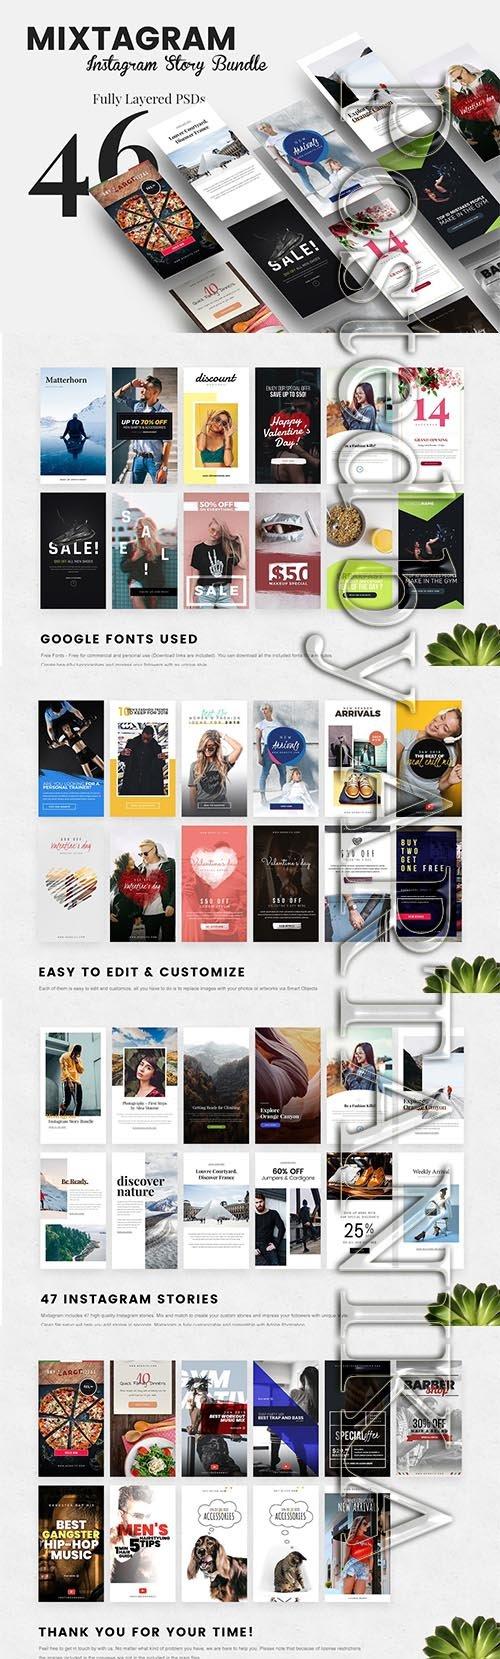 CreativeMarket - MIXTAGRAM - Instagram Story Bundle 2266619